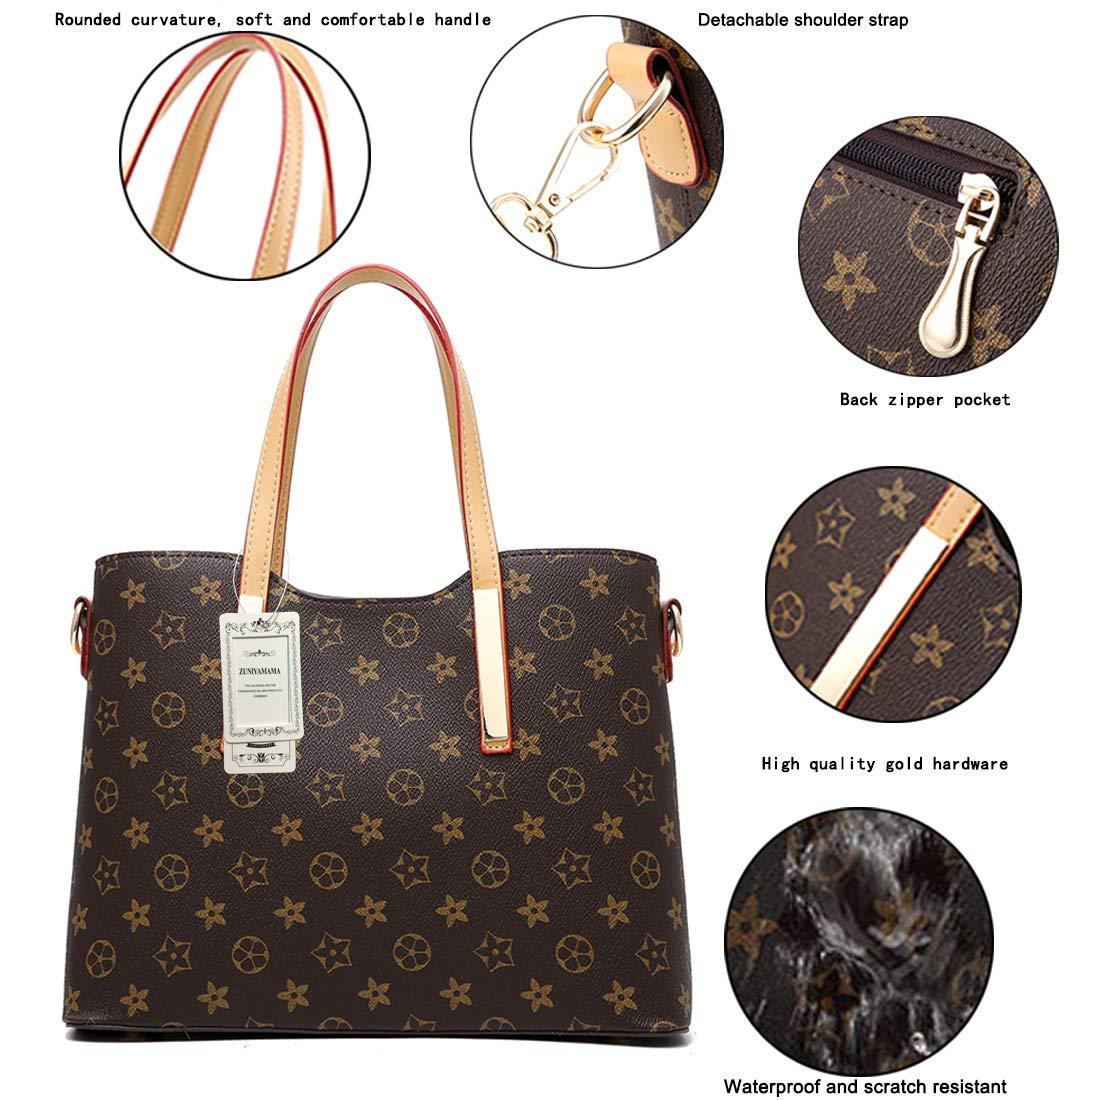 Waterproof Leather Handbags Set for Women Fashion Purse Shouler Totes Bags ¡